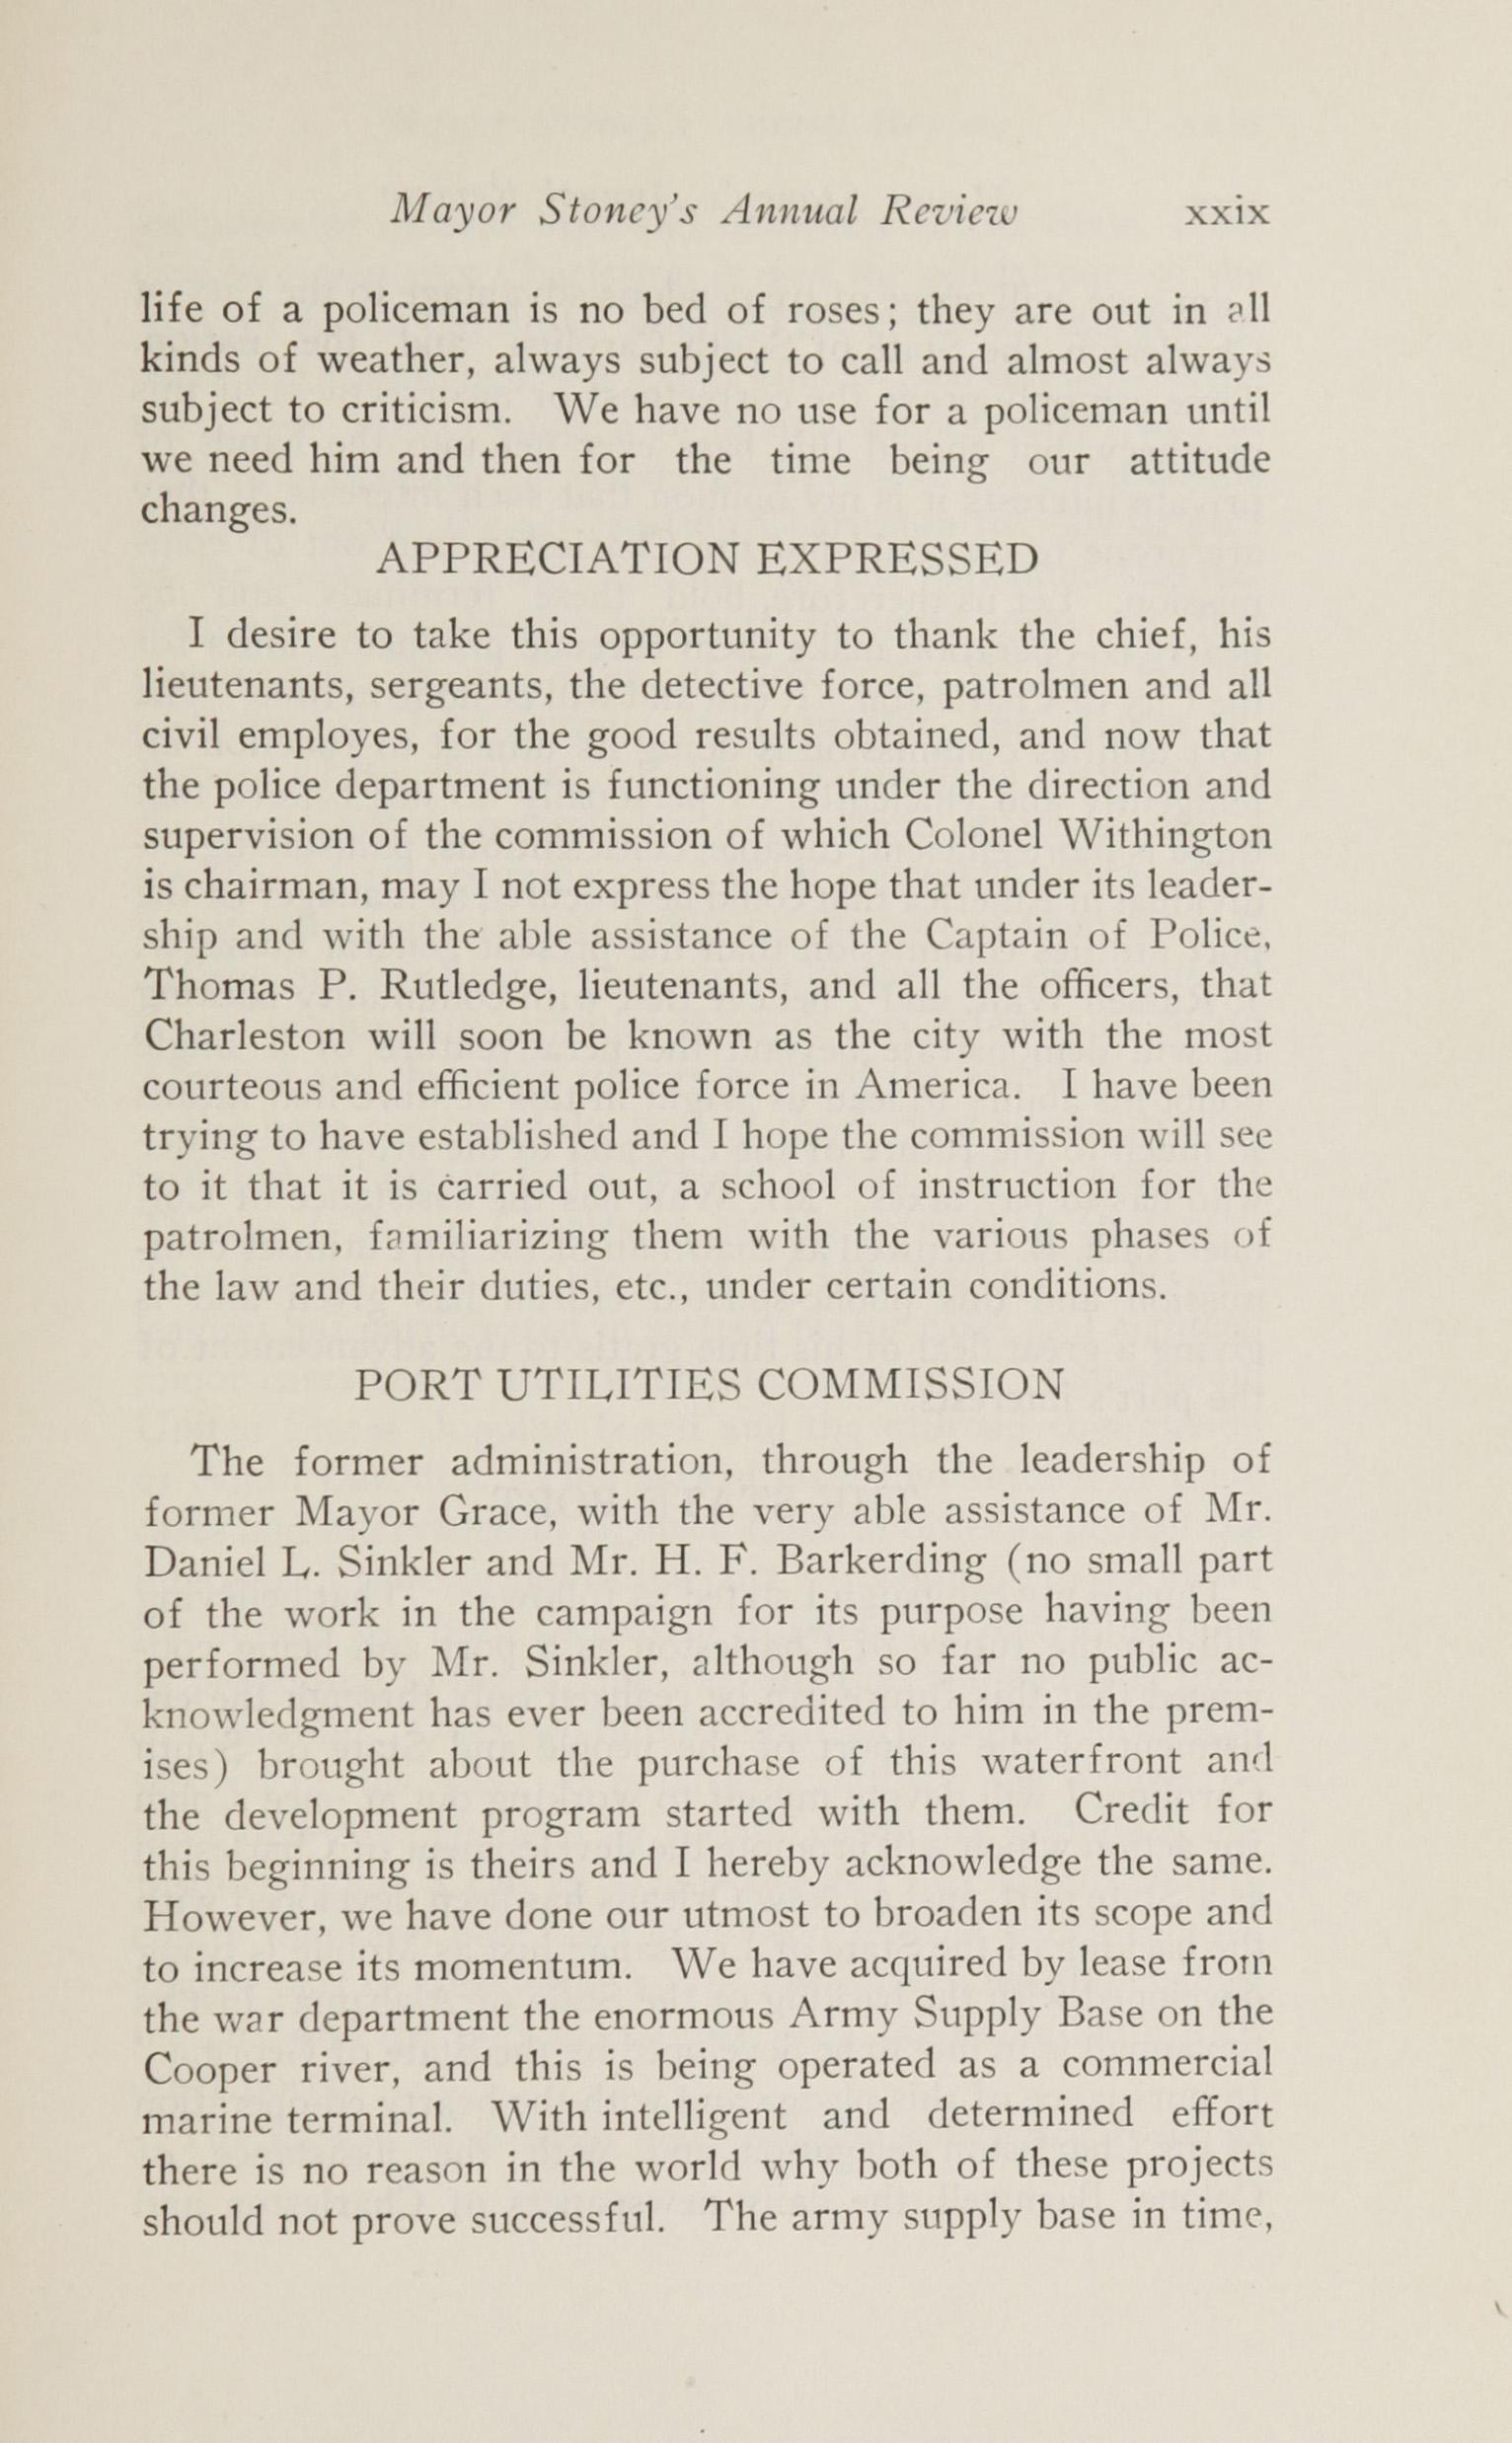 Charleston Yearbook, 1924, page xxix